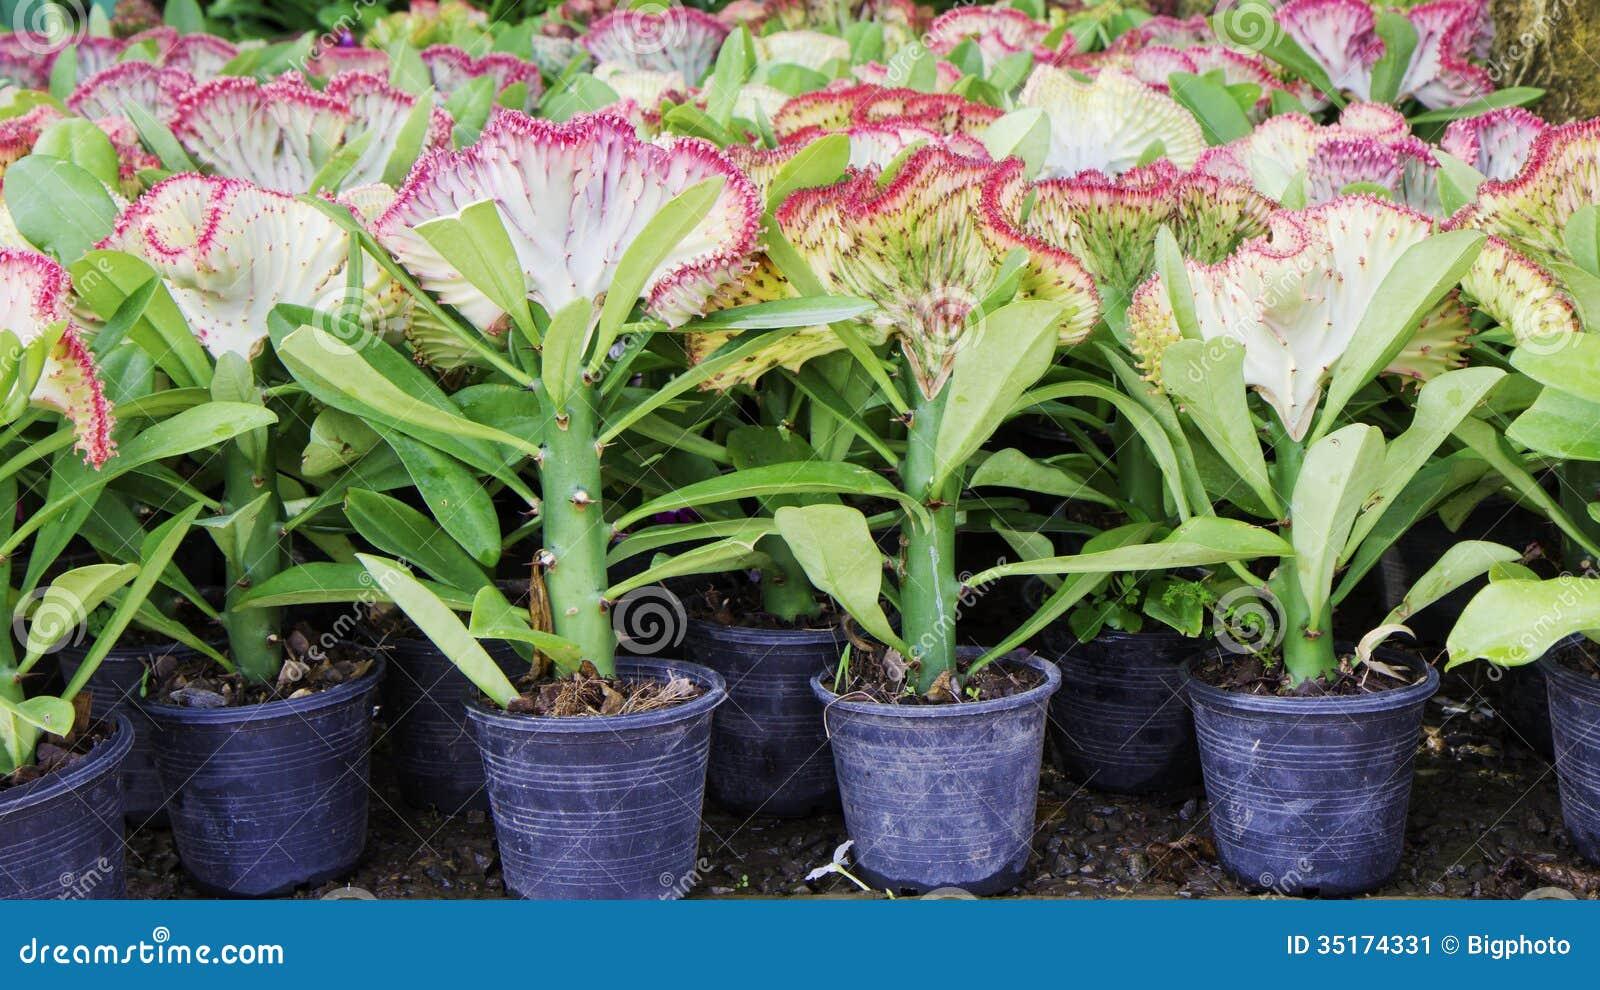 Euphorbia Lactea Cristata In A Colorful Flower Pot Stock